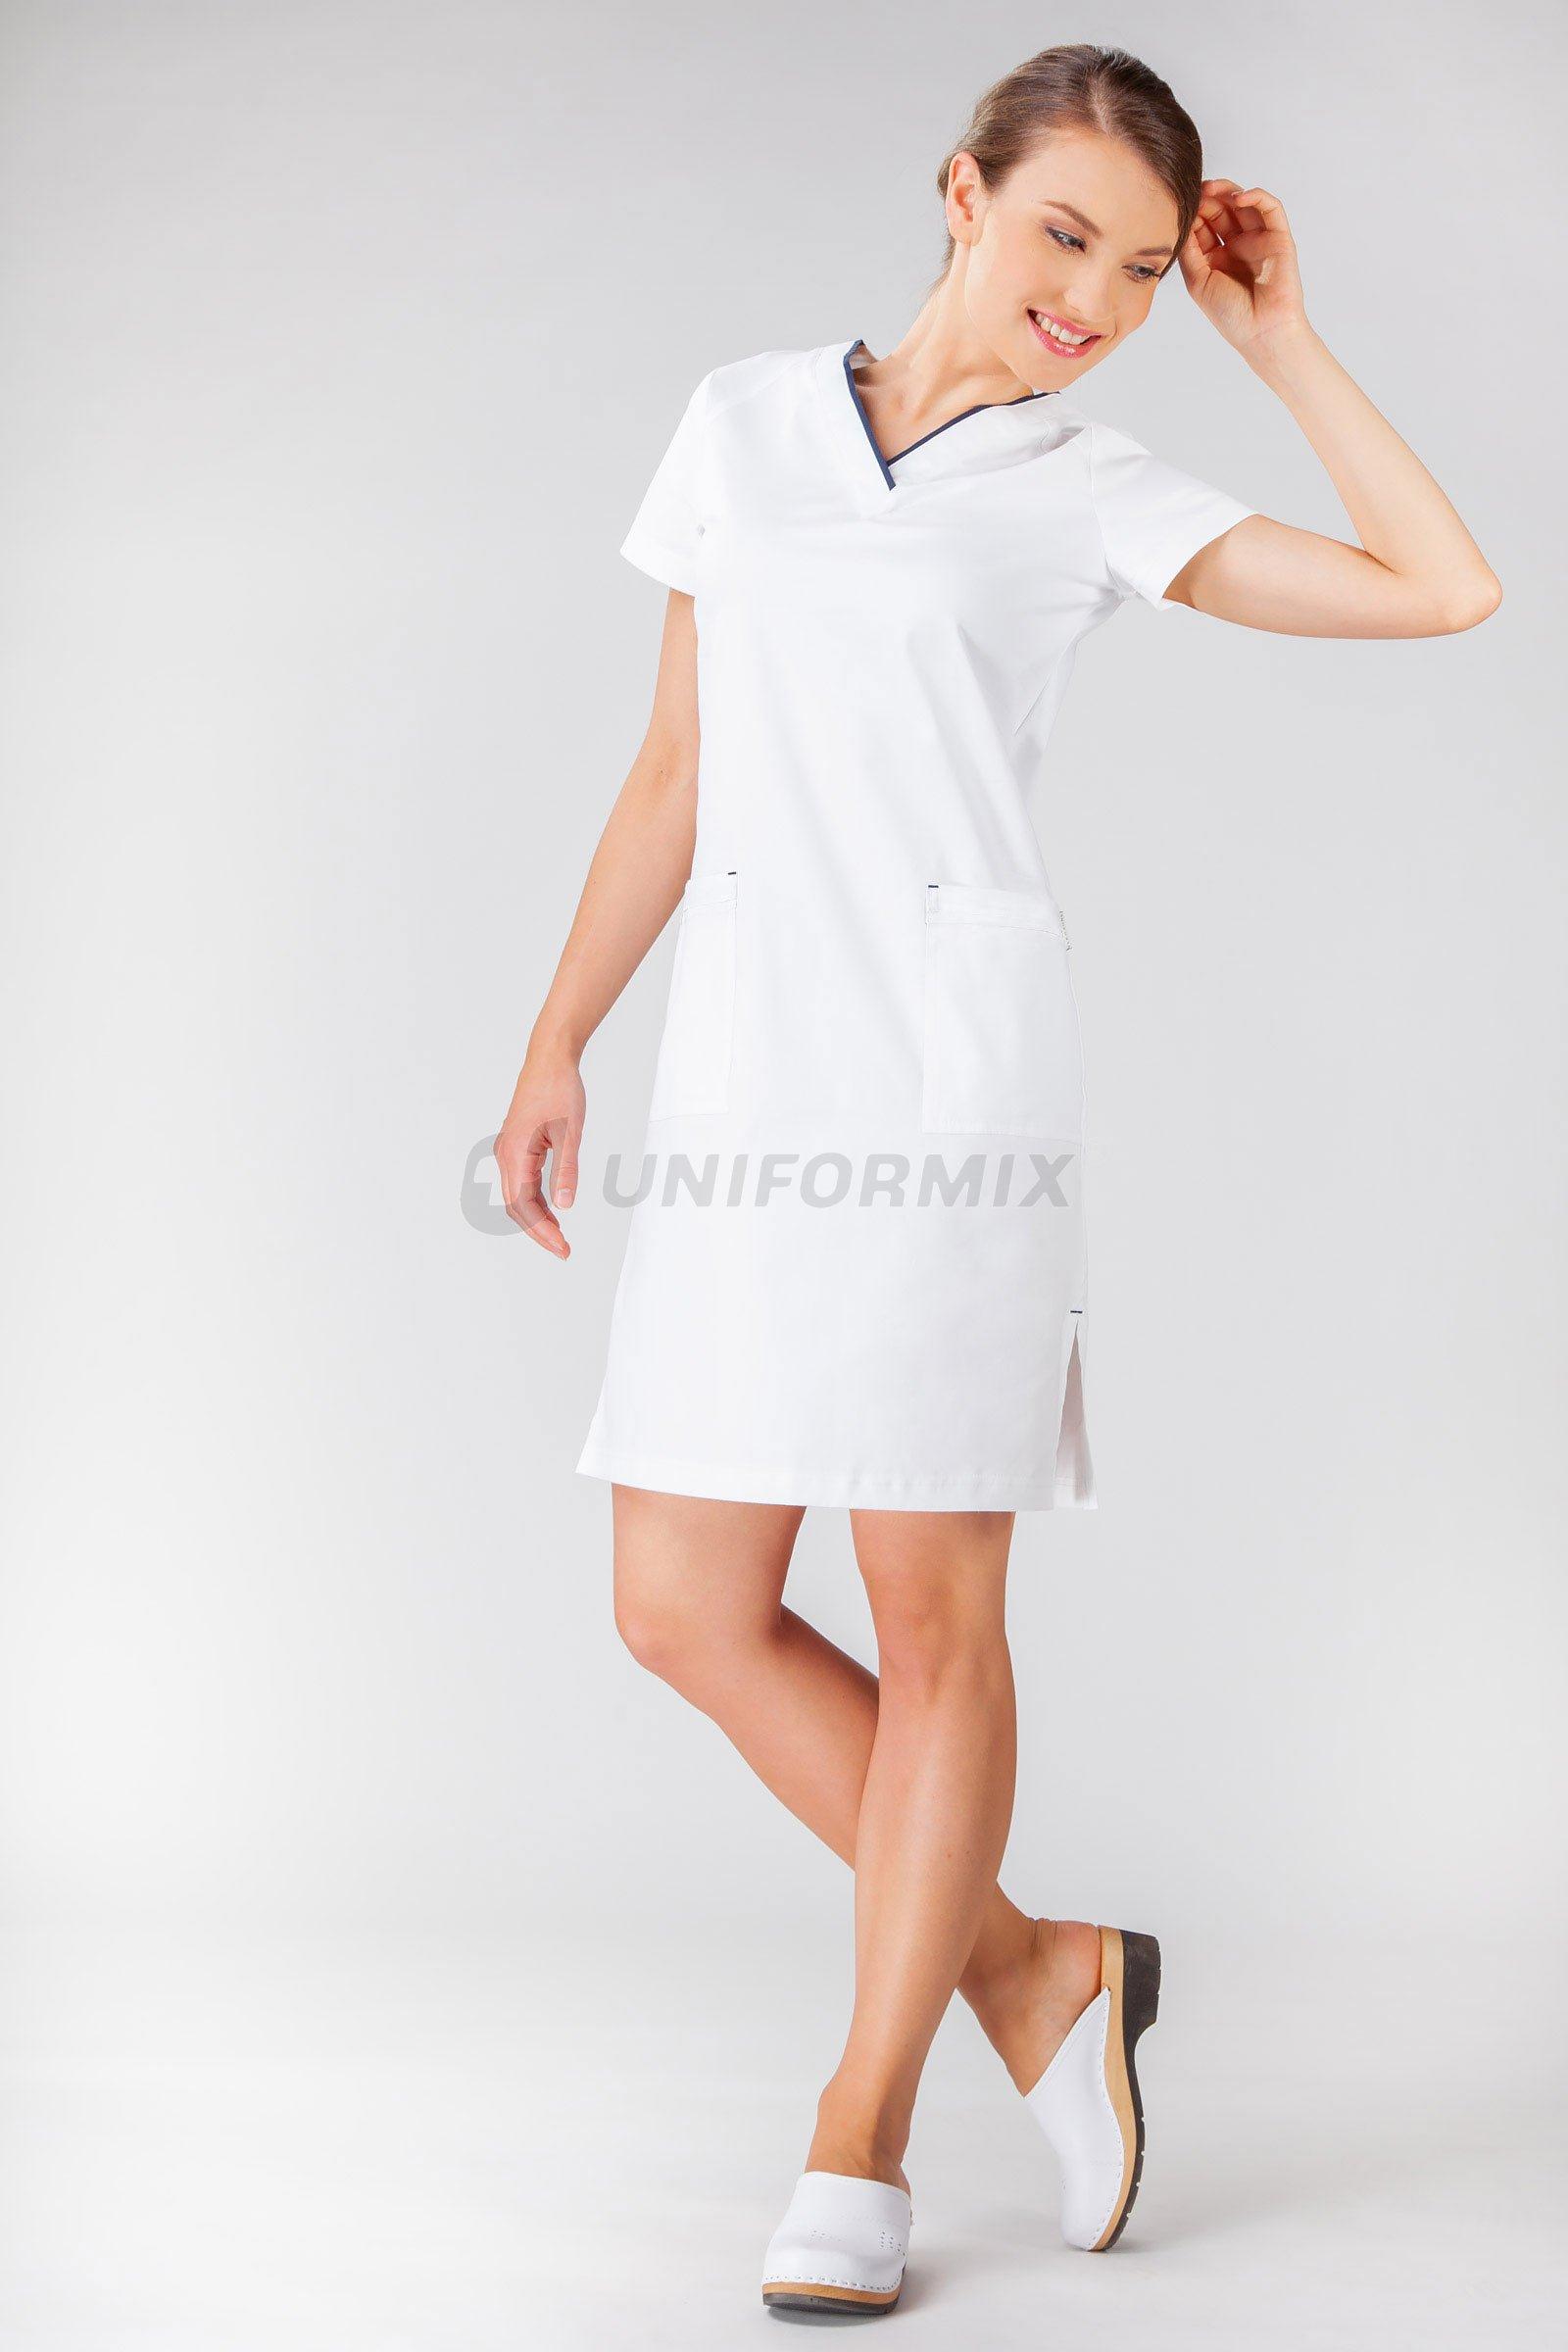 61f835f8c Dámské šaty FLEX ZONE FZ2052 bílý/tmavomodrý - Uniformix